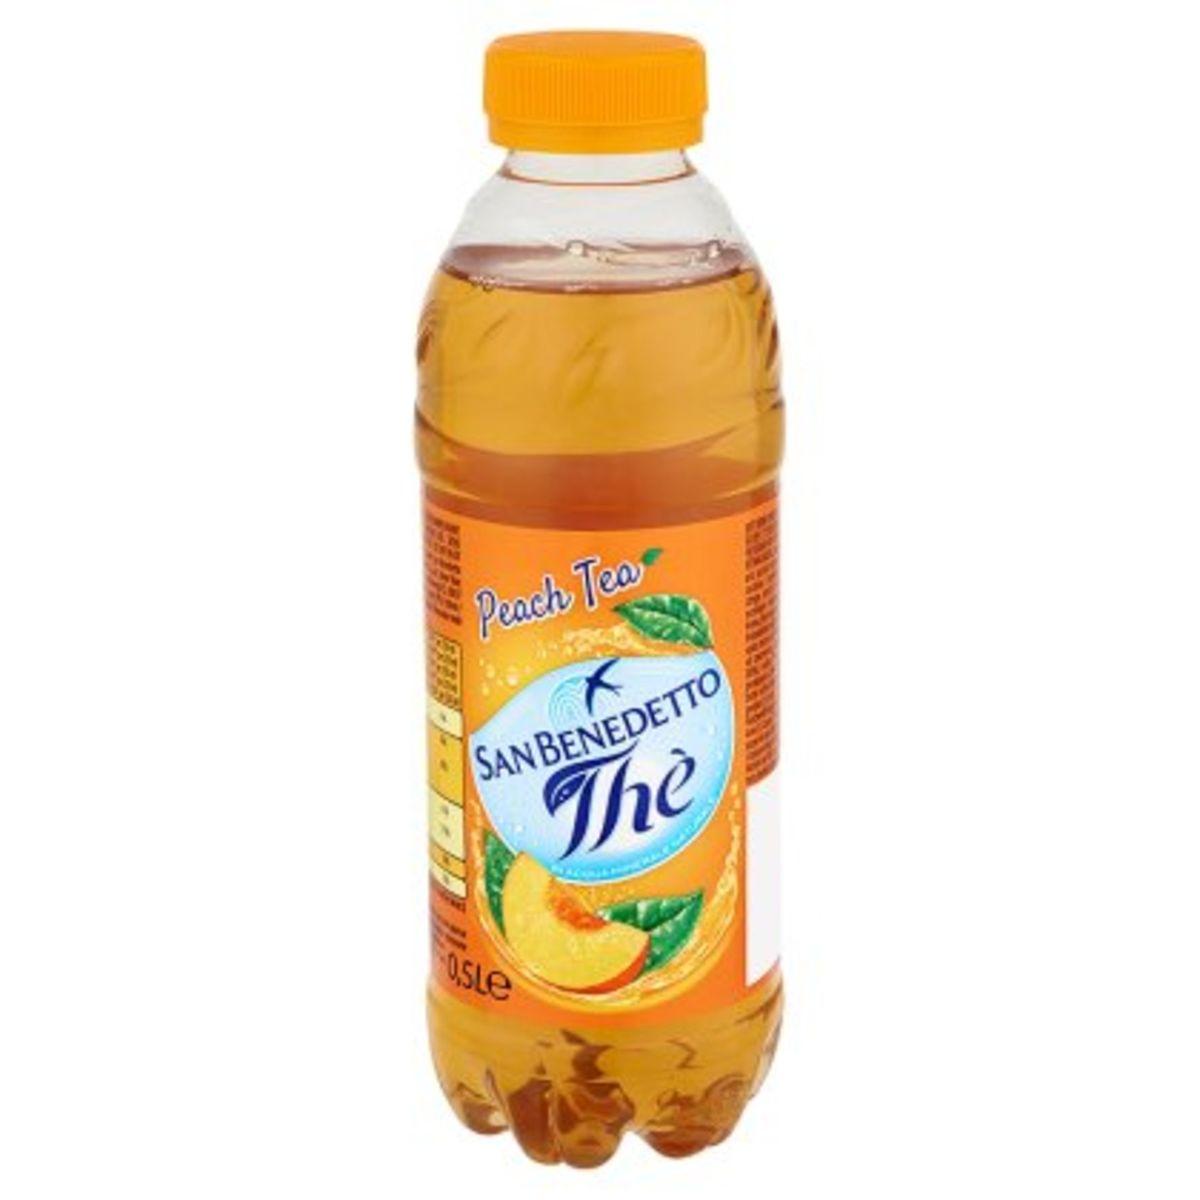 San Benedetto Thè Peach Tea 0,5 L